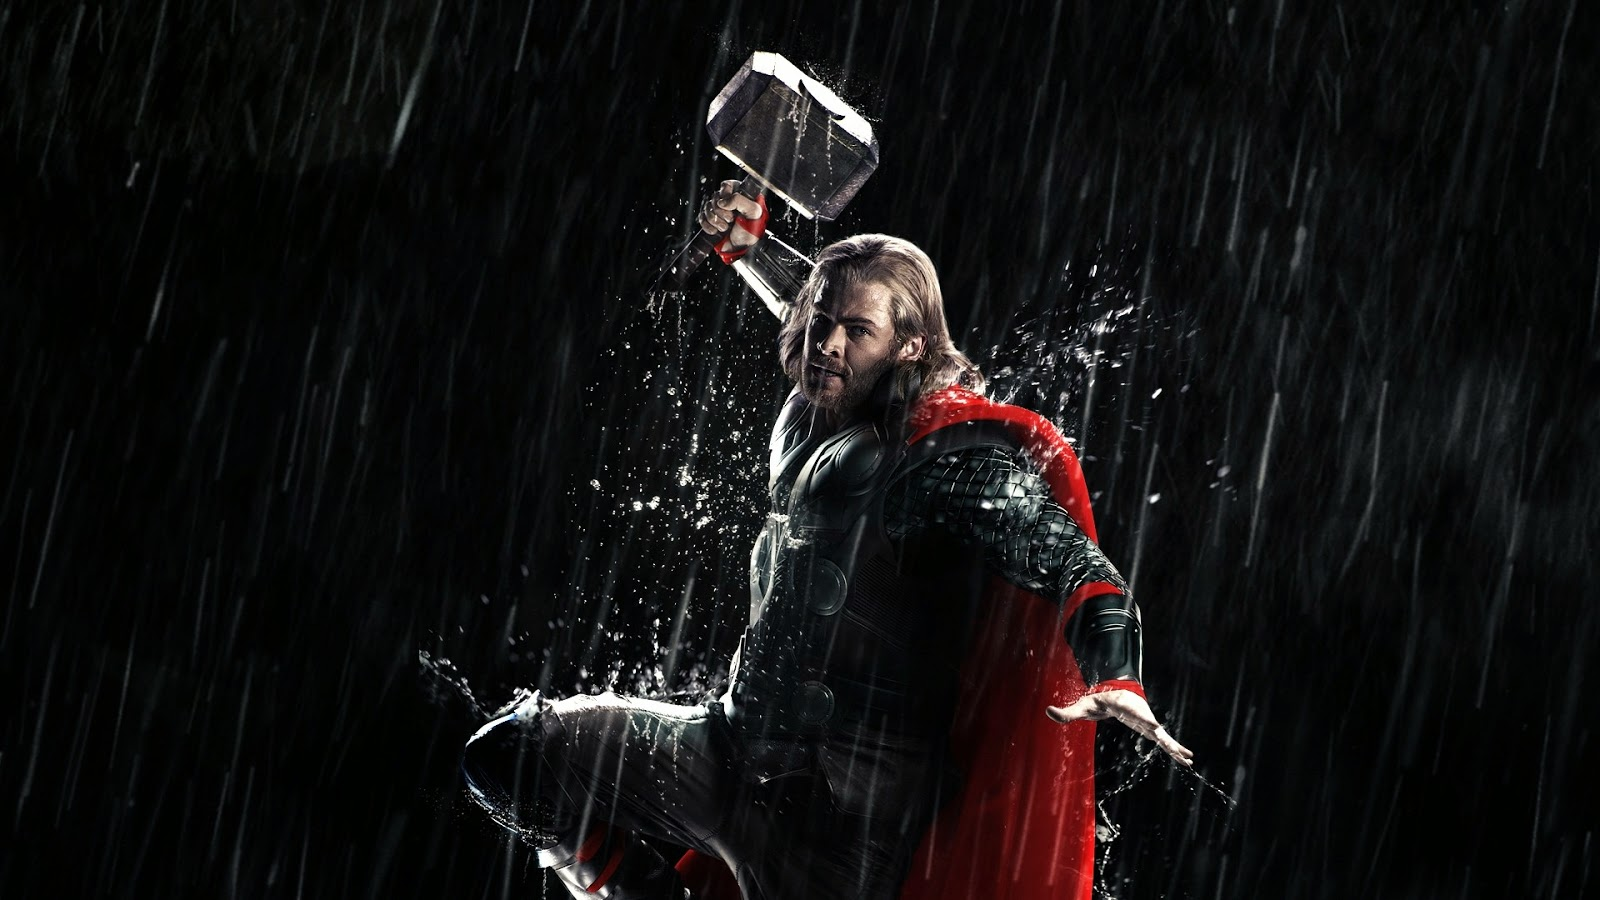 Lightning-warrior-god-Thor